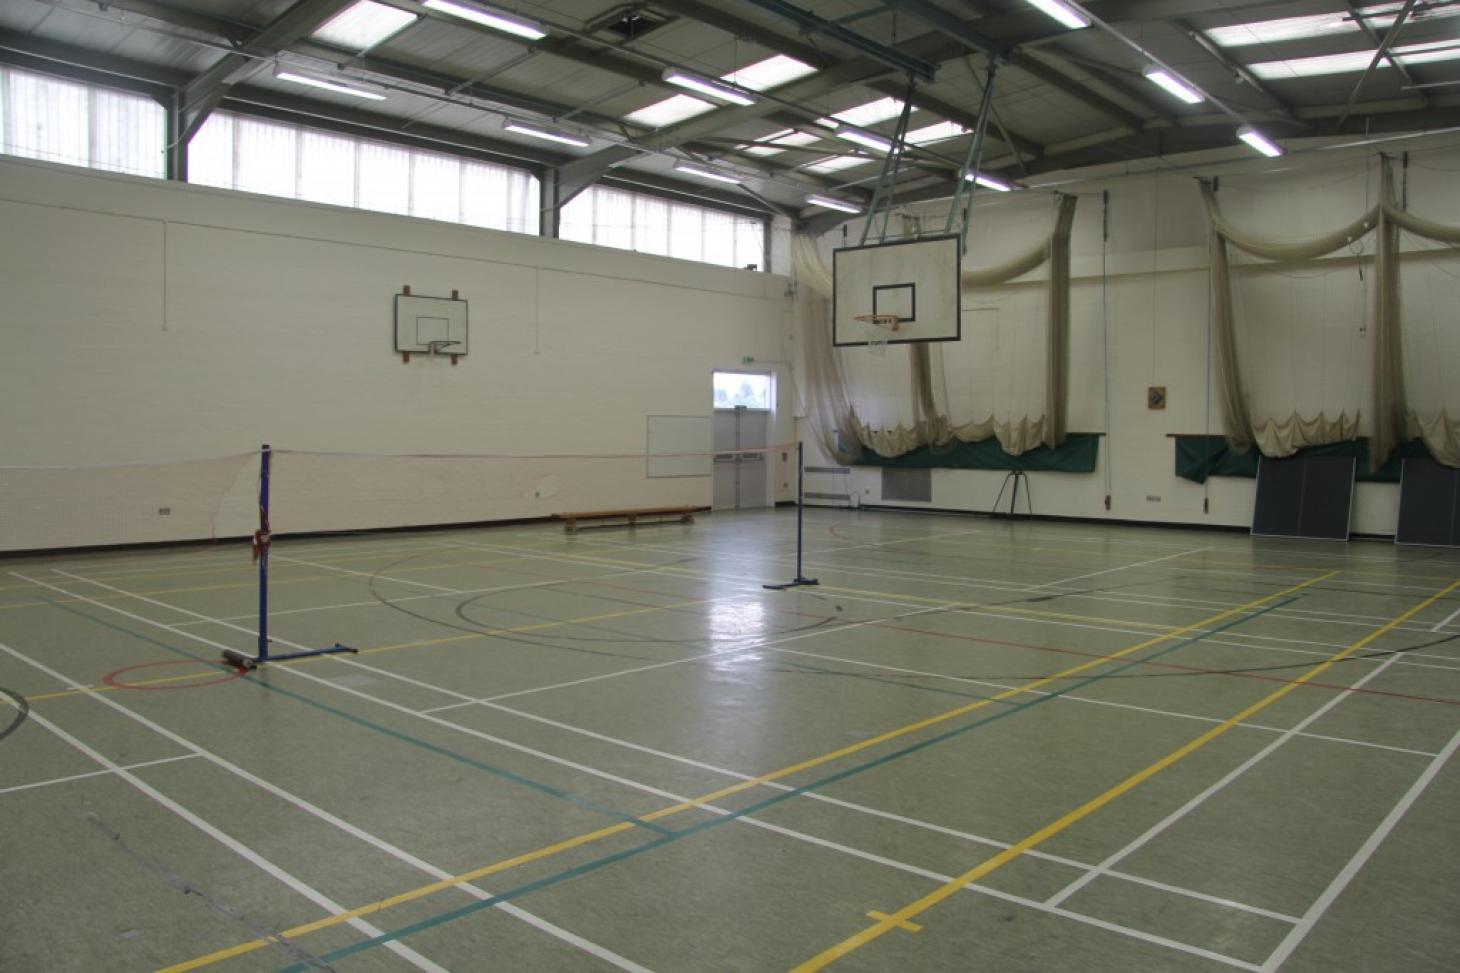 Ashcroft High School Indoor basketball court